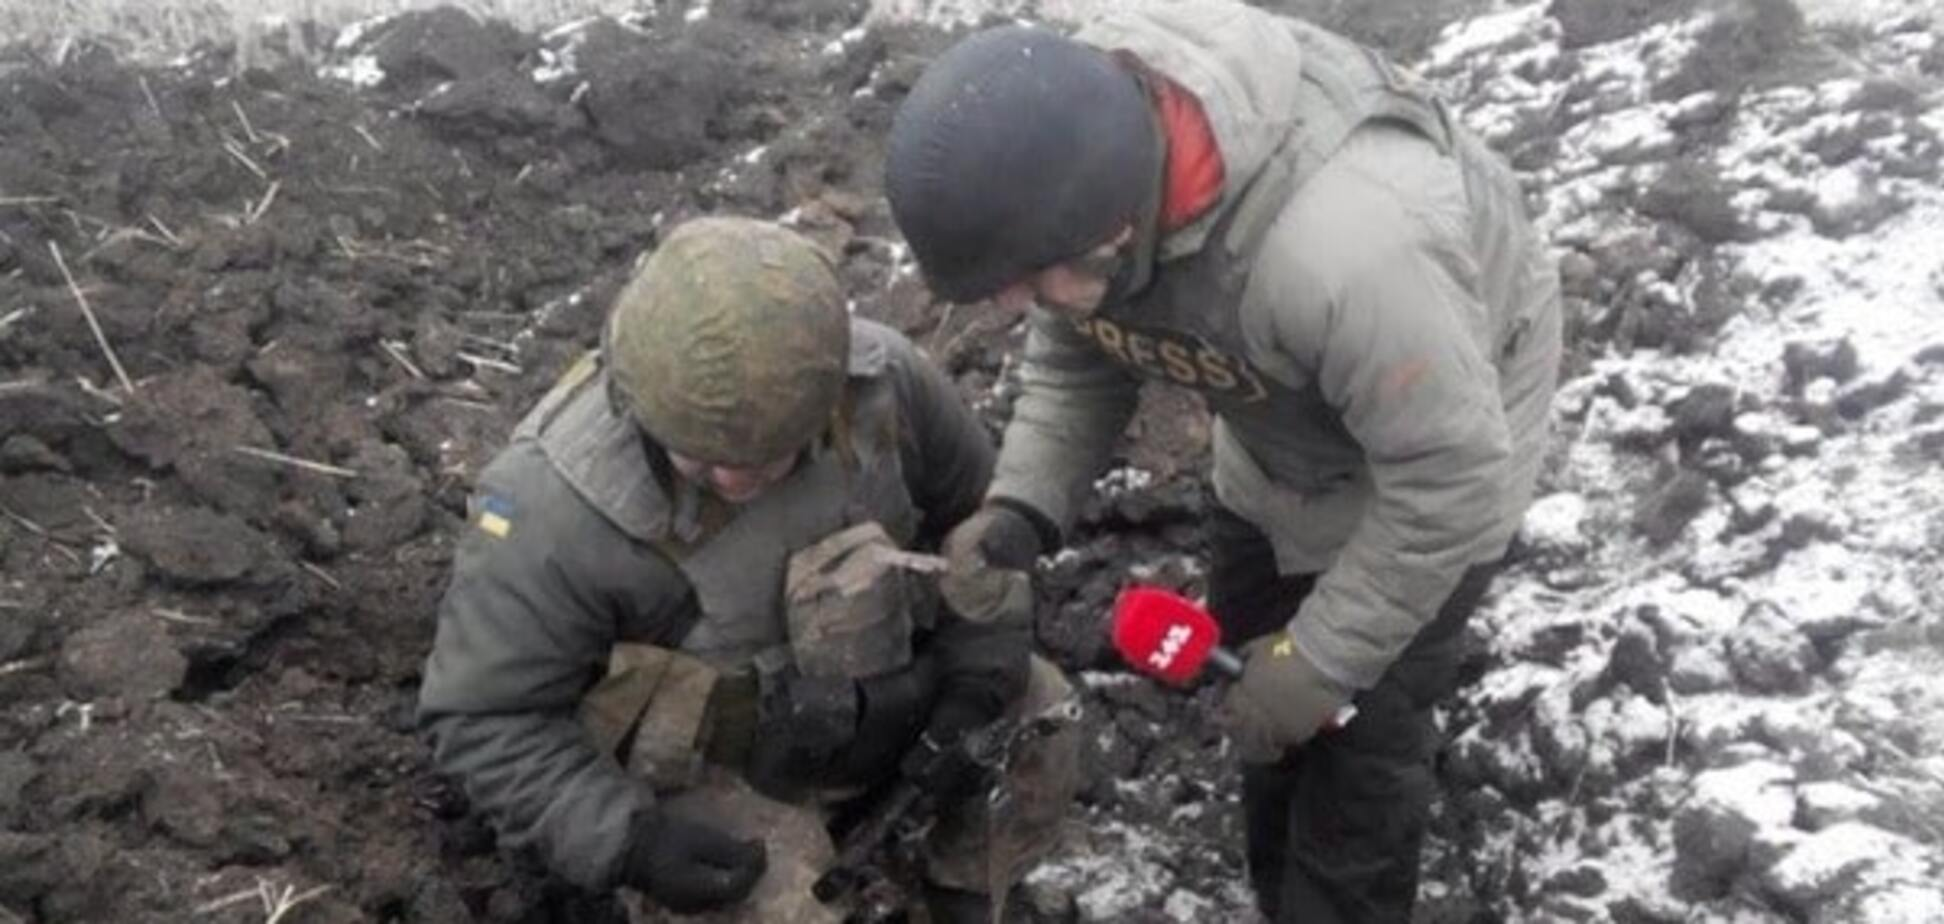 Журналист разоблачил новую тактику террористов на Донбассе